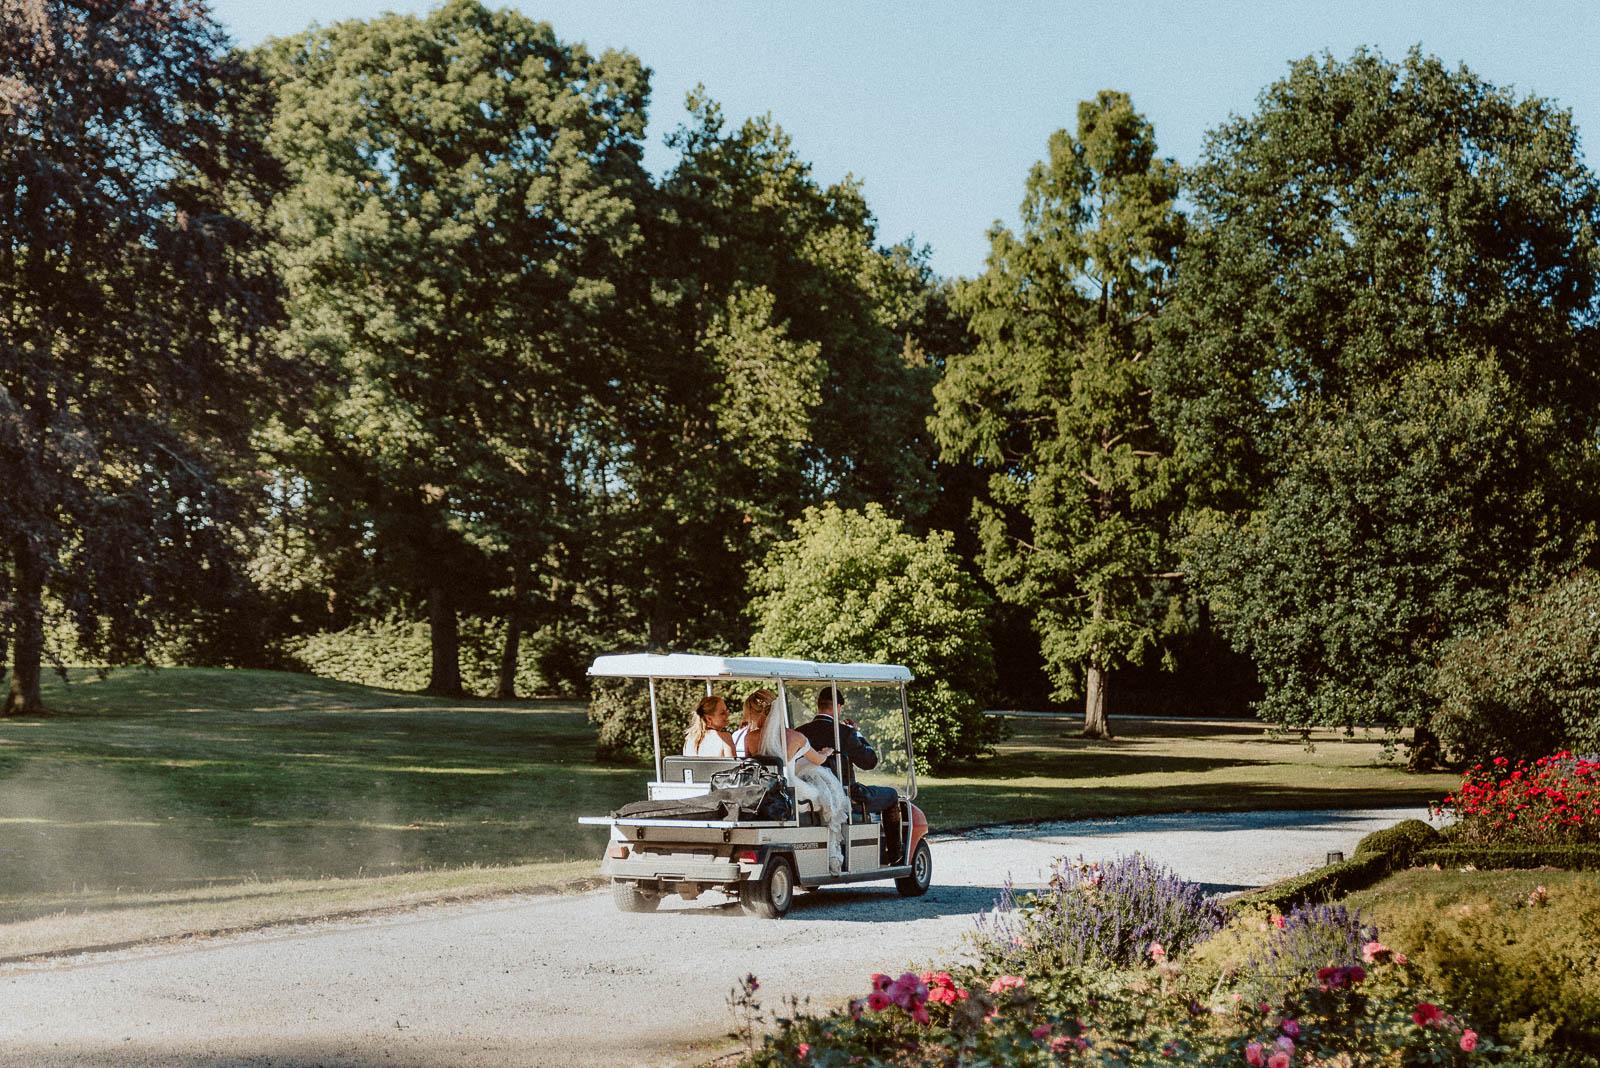 Schloss Hertefeld Golf Cart Hochzeit Hochzeitsauto